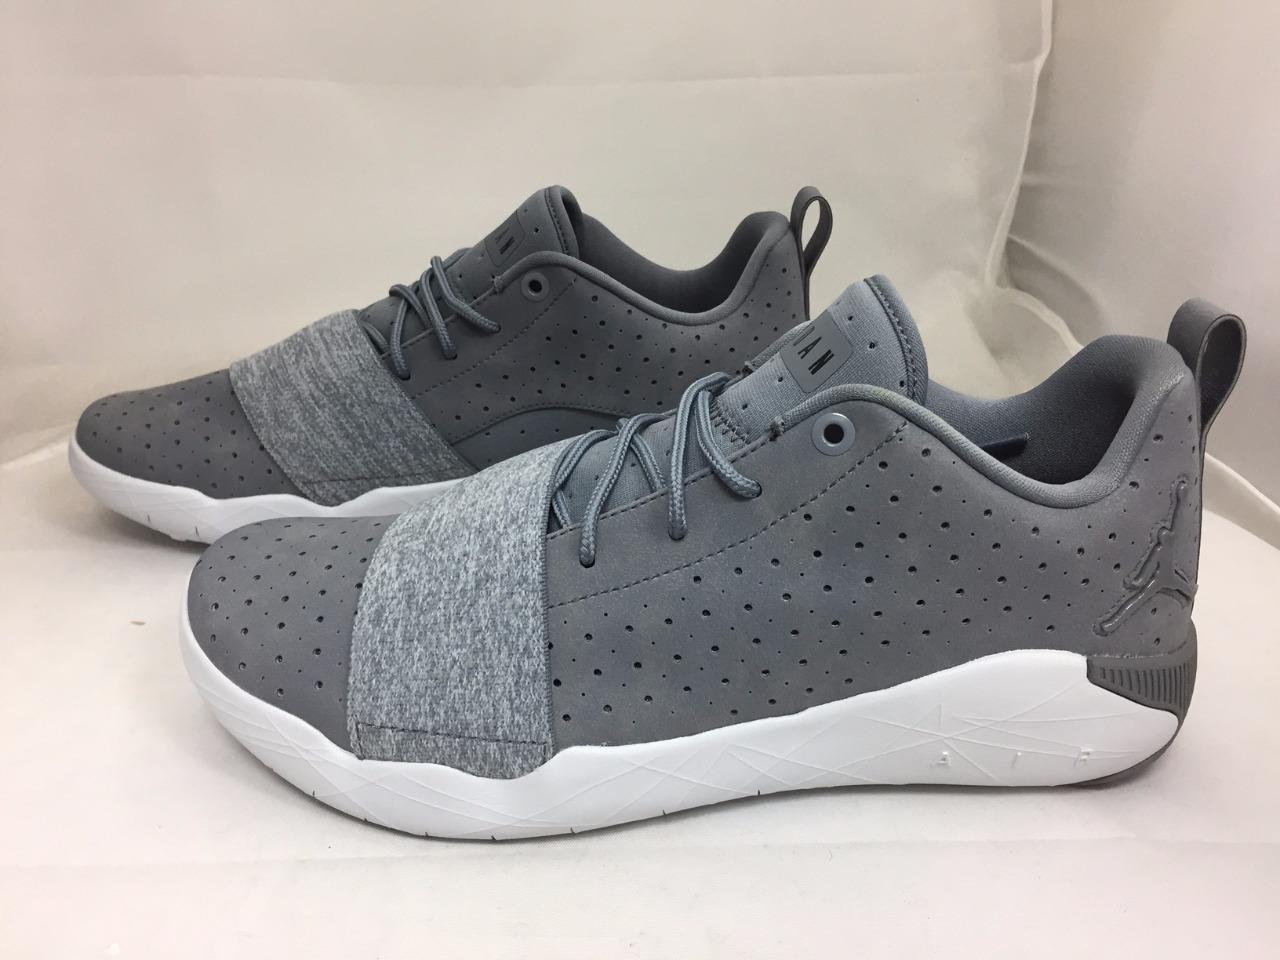 NEW MEN'S   JORDAN 23 BREAKOUT 881449-003 Cheap women's shoes women's shoes